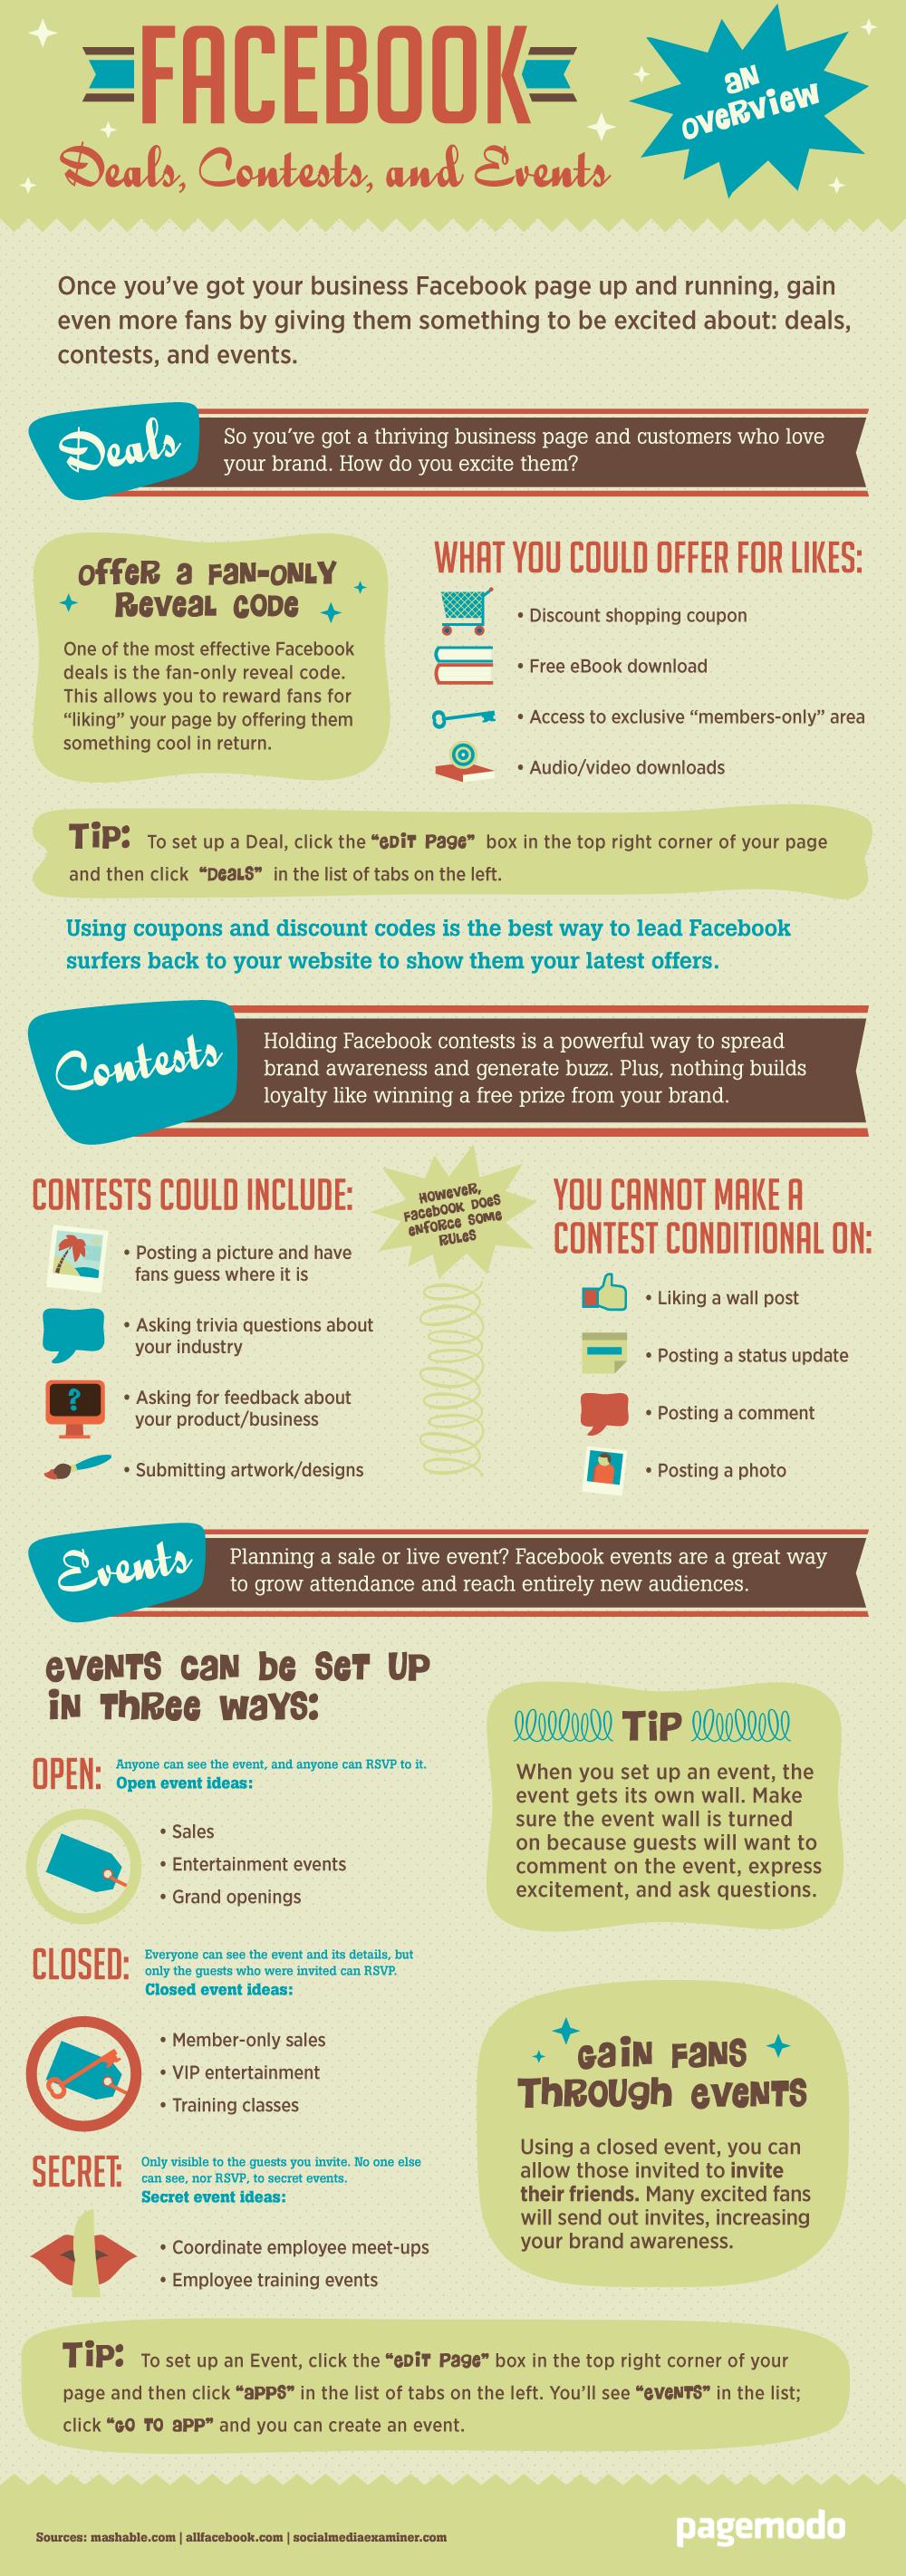 Facebook Deals, Contests and Events